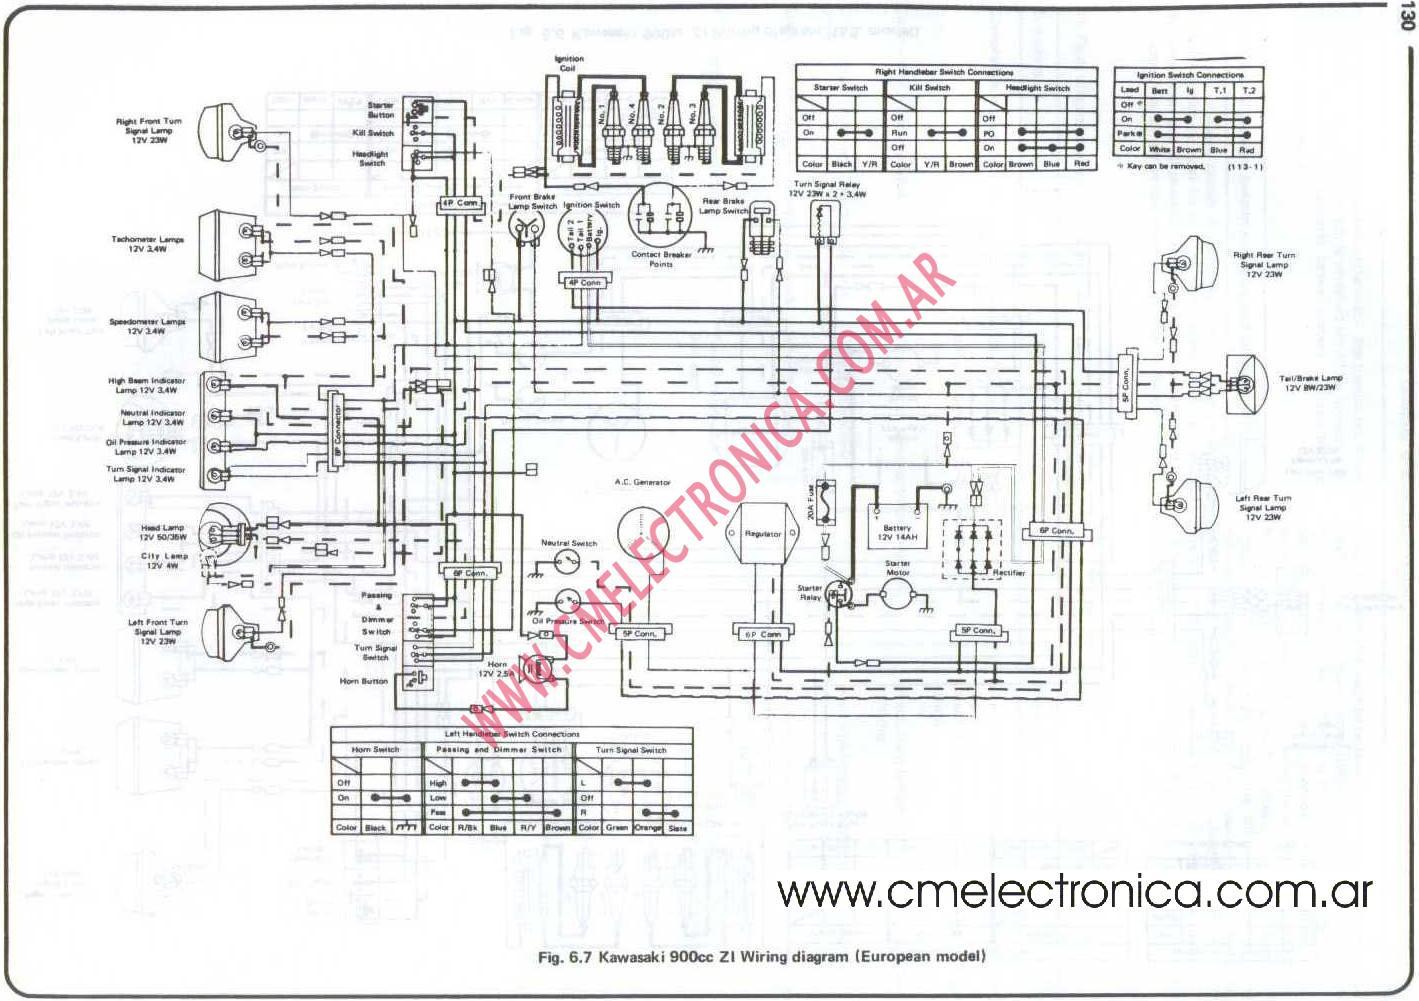 Kawasaki Mule Kaf400a Wiring Diagram